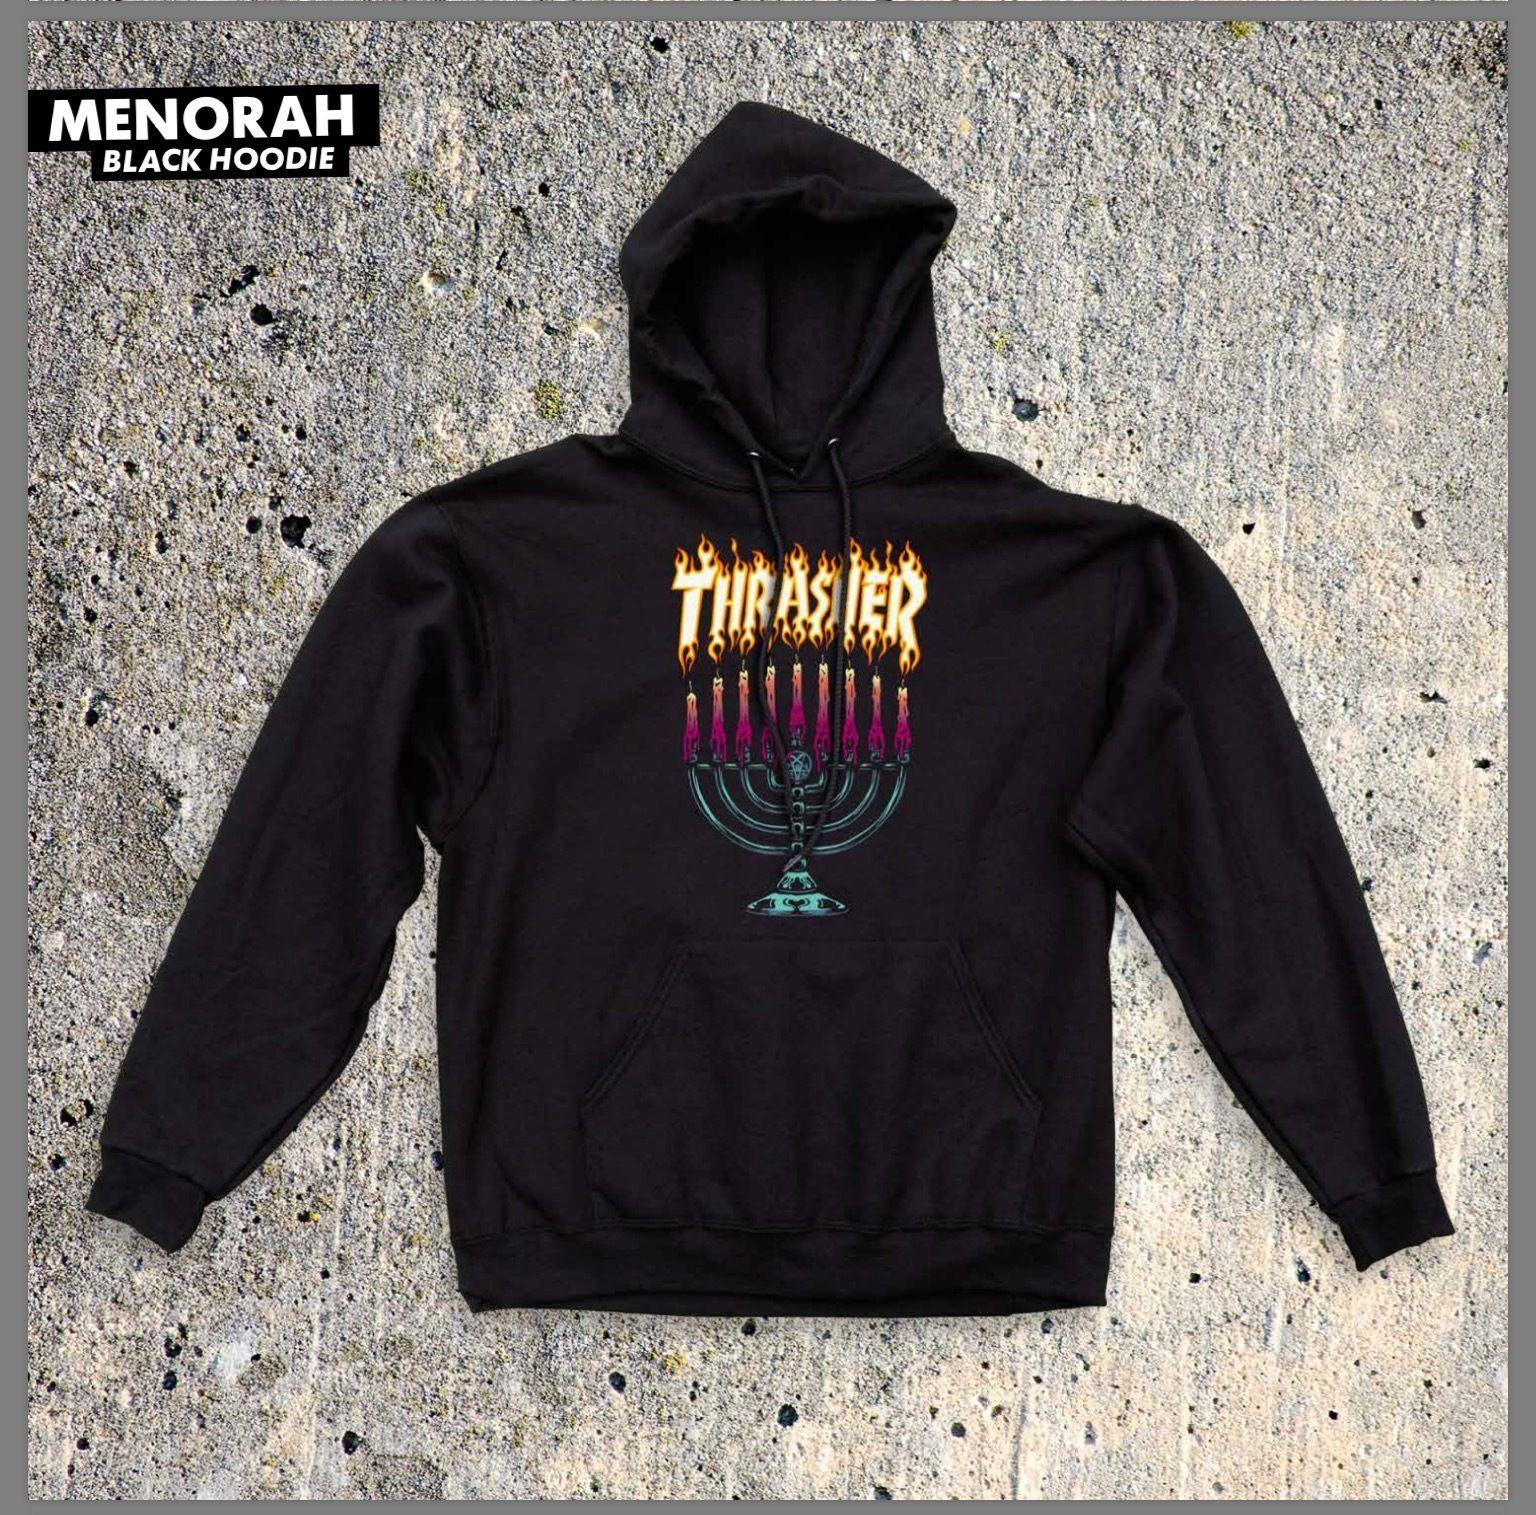 Men 159067 Thrasher Magazine Menorah Black Hoodie Hooded Sweatshirt M L Xl Flame Supreme Buy It Now Only 49 95 Hoodies Black Hoodie Hooded Sweatshirts [ 1515 x 1536 Pixel ]